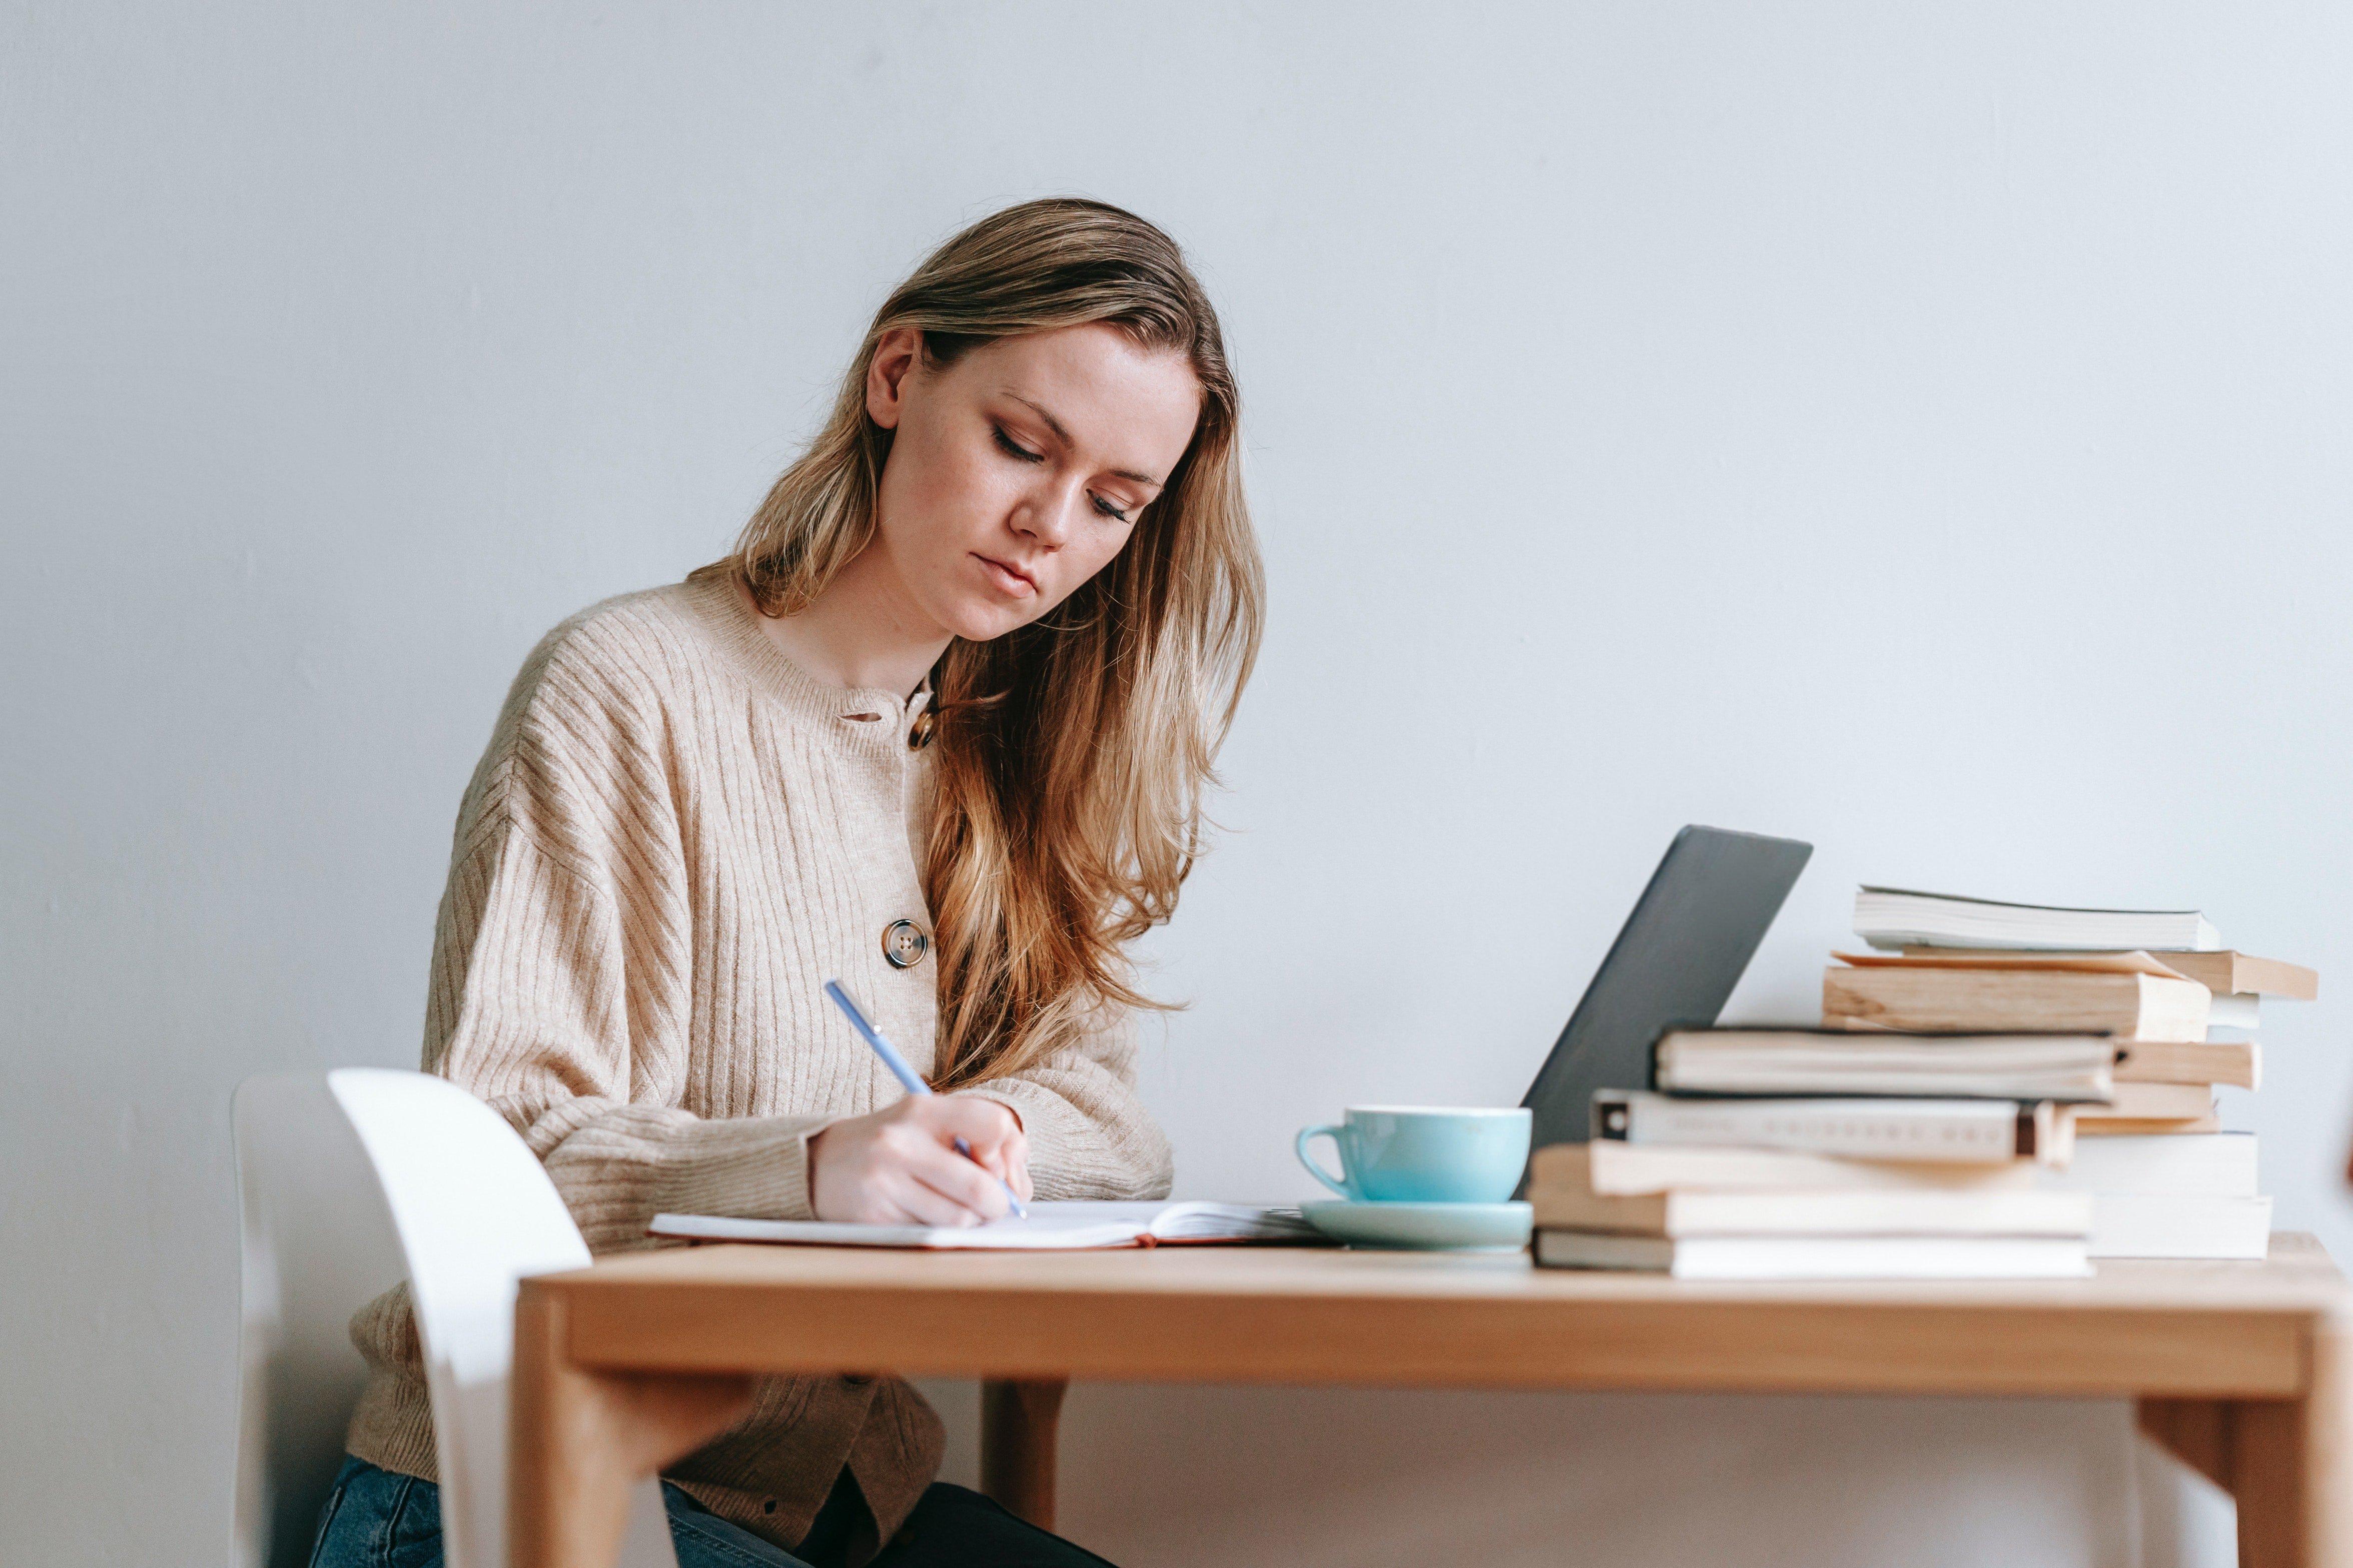 5 Best HR Management Certifications In 2022